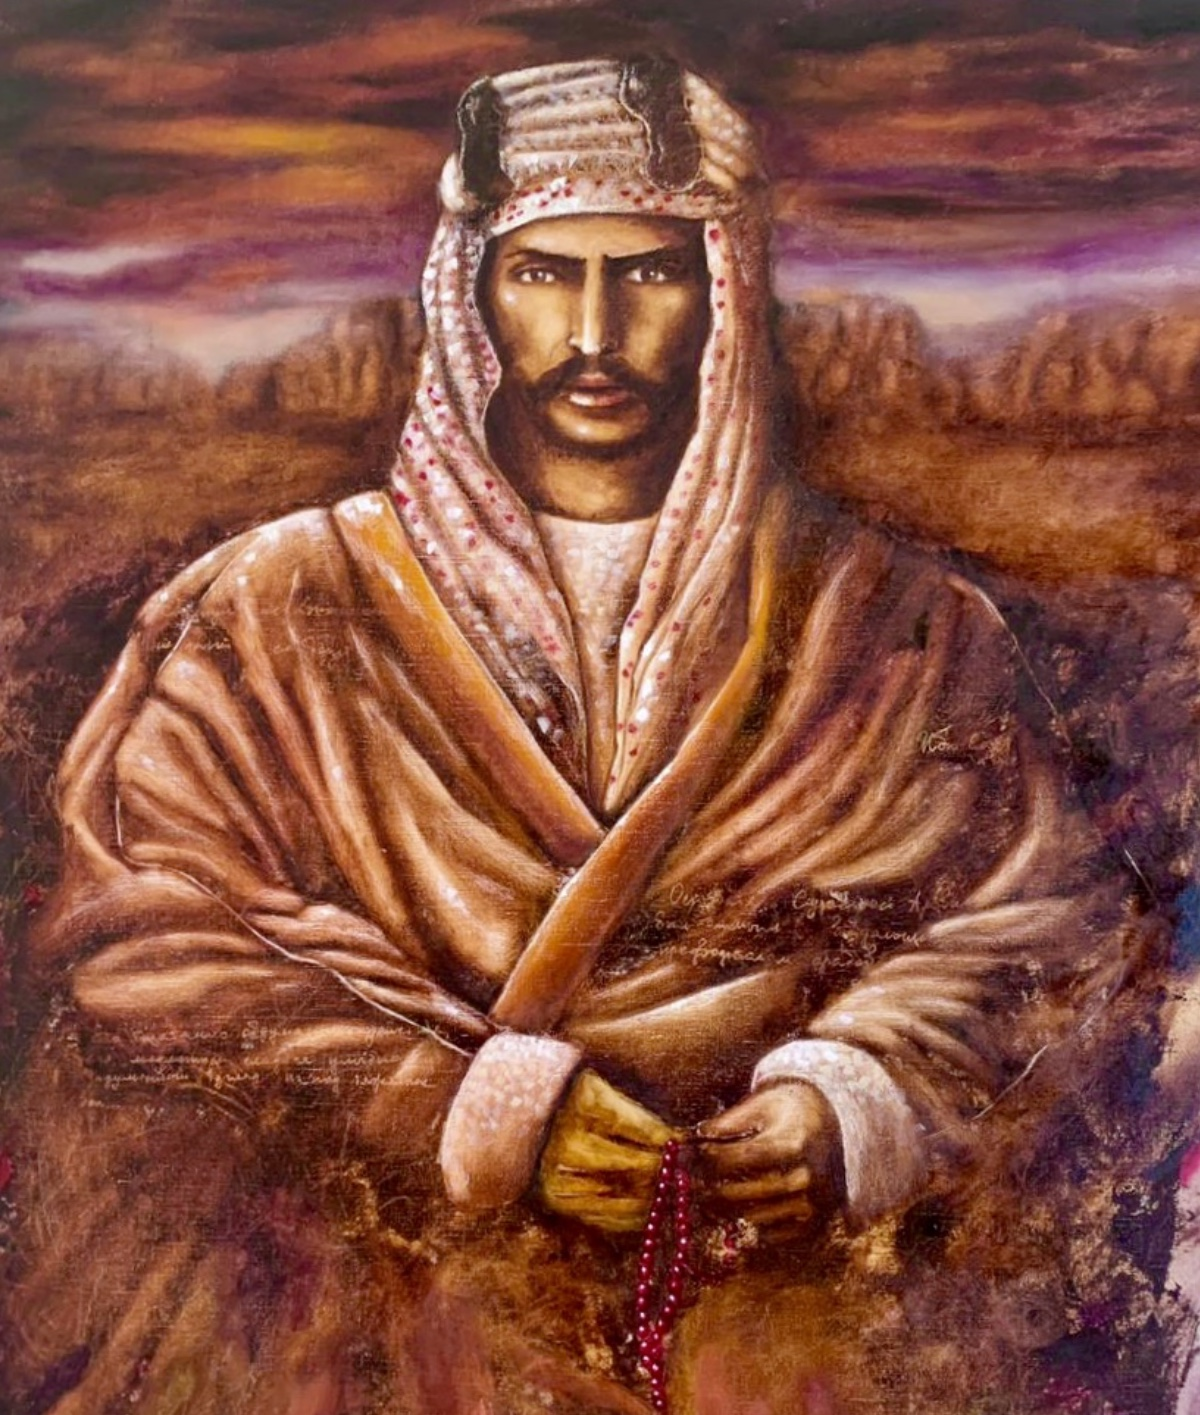 King Abdulaziz Al-Saud